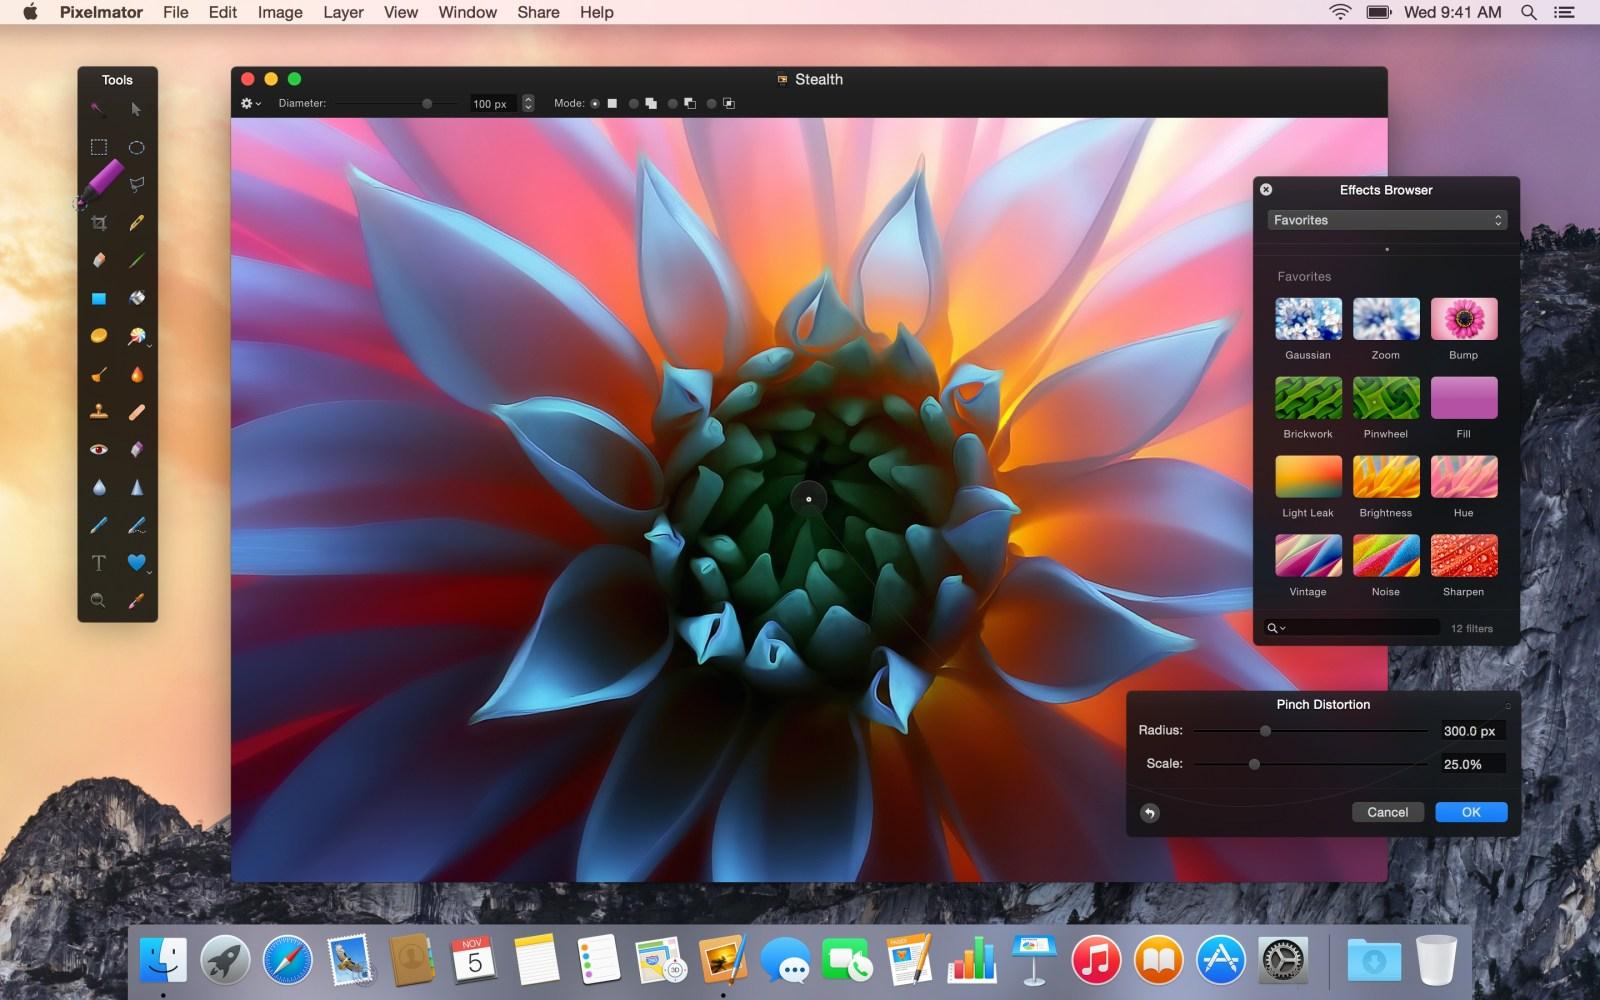 Pixelmator 3.3 released with OS X Yosemite optimizations, Repair Tool extension